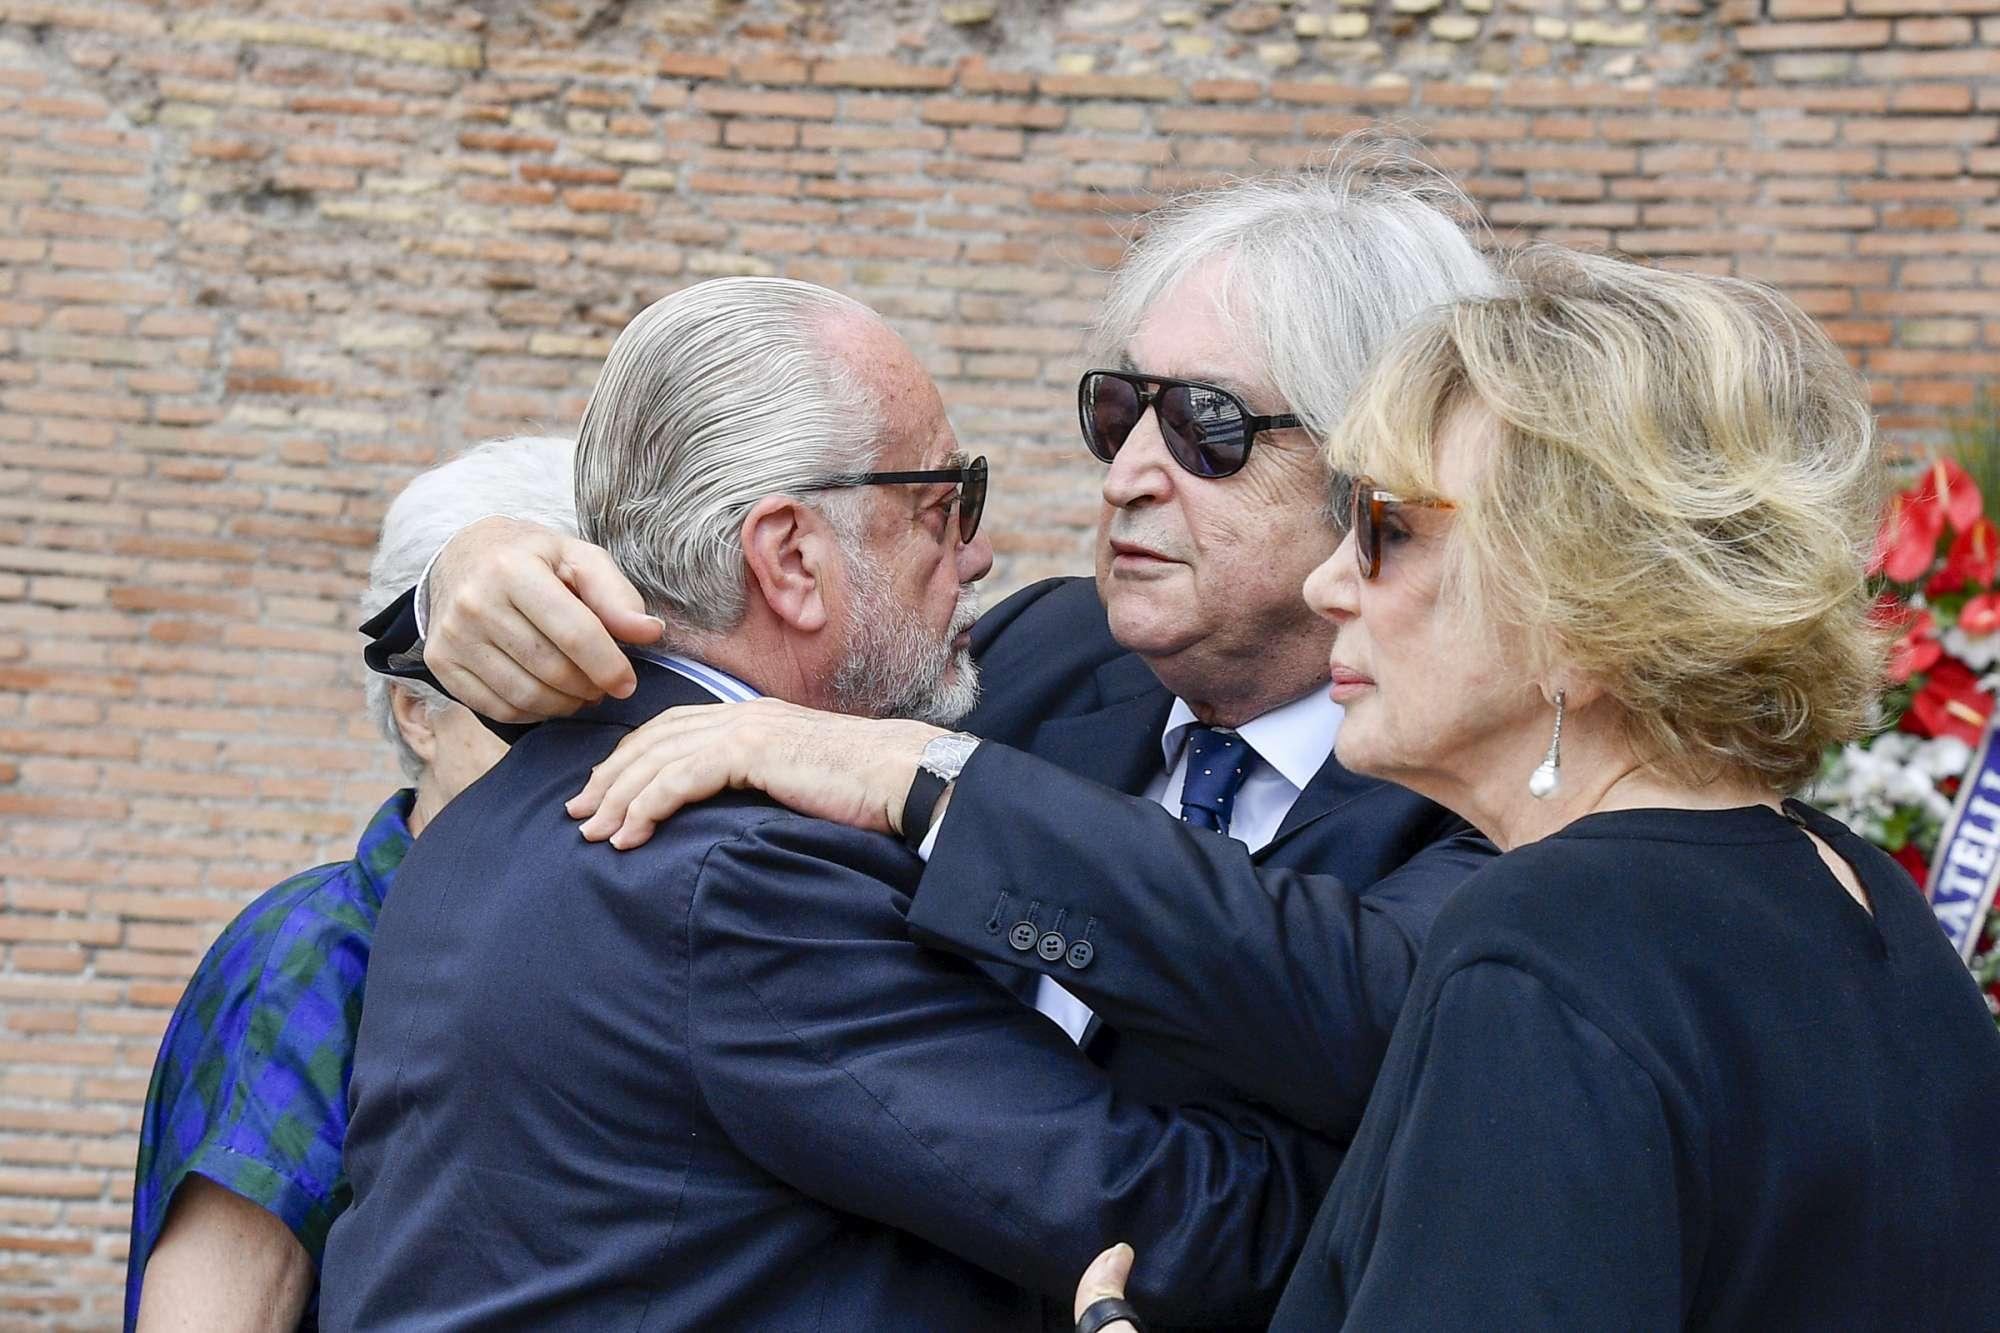 Folla di vip ai funerali di Carlo Vanzina